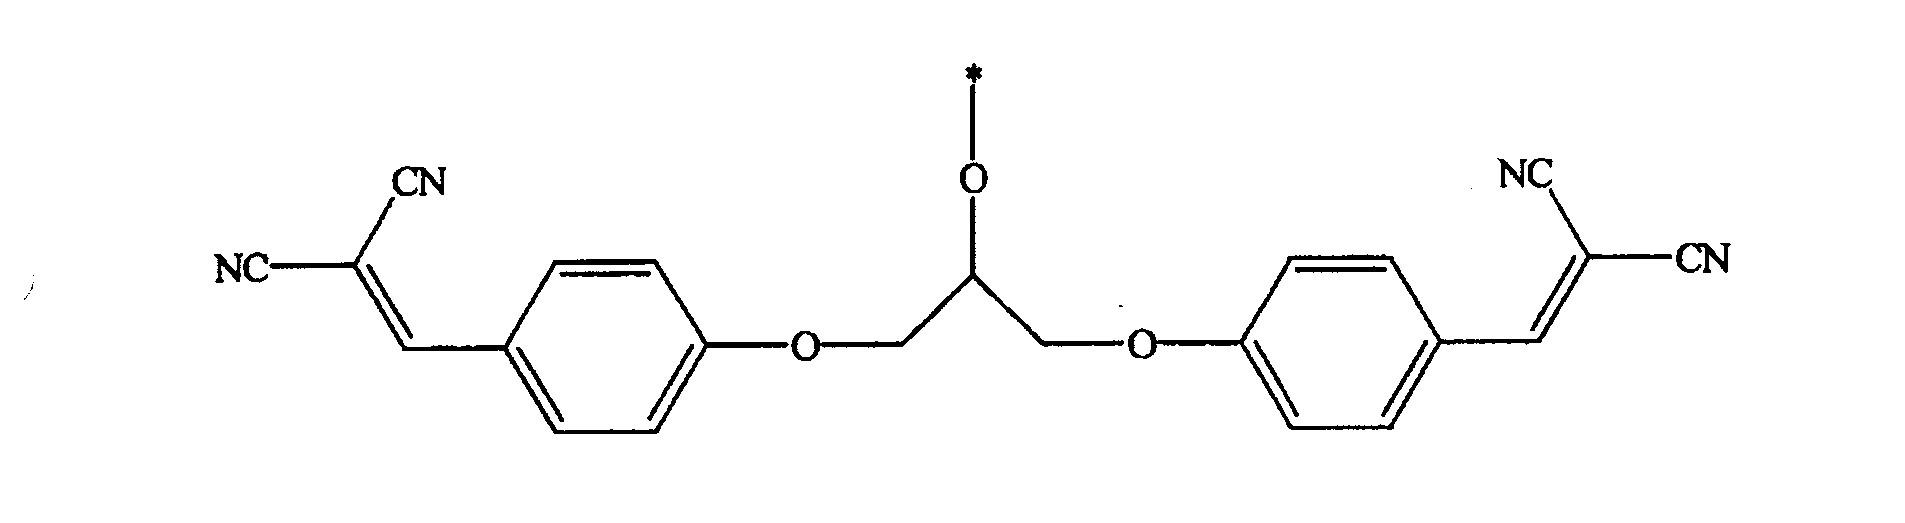 Figure 712011001004300-pct00058